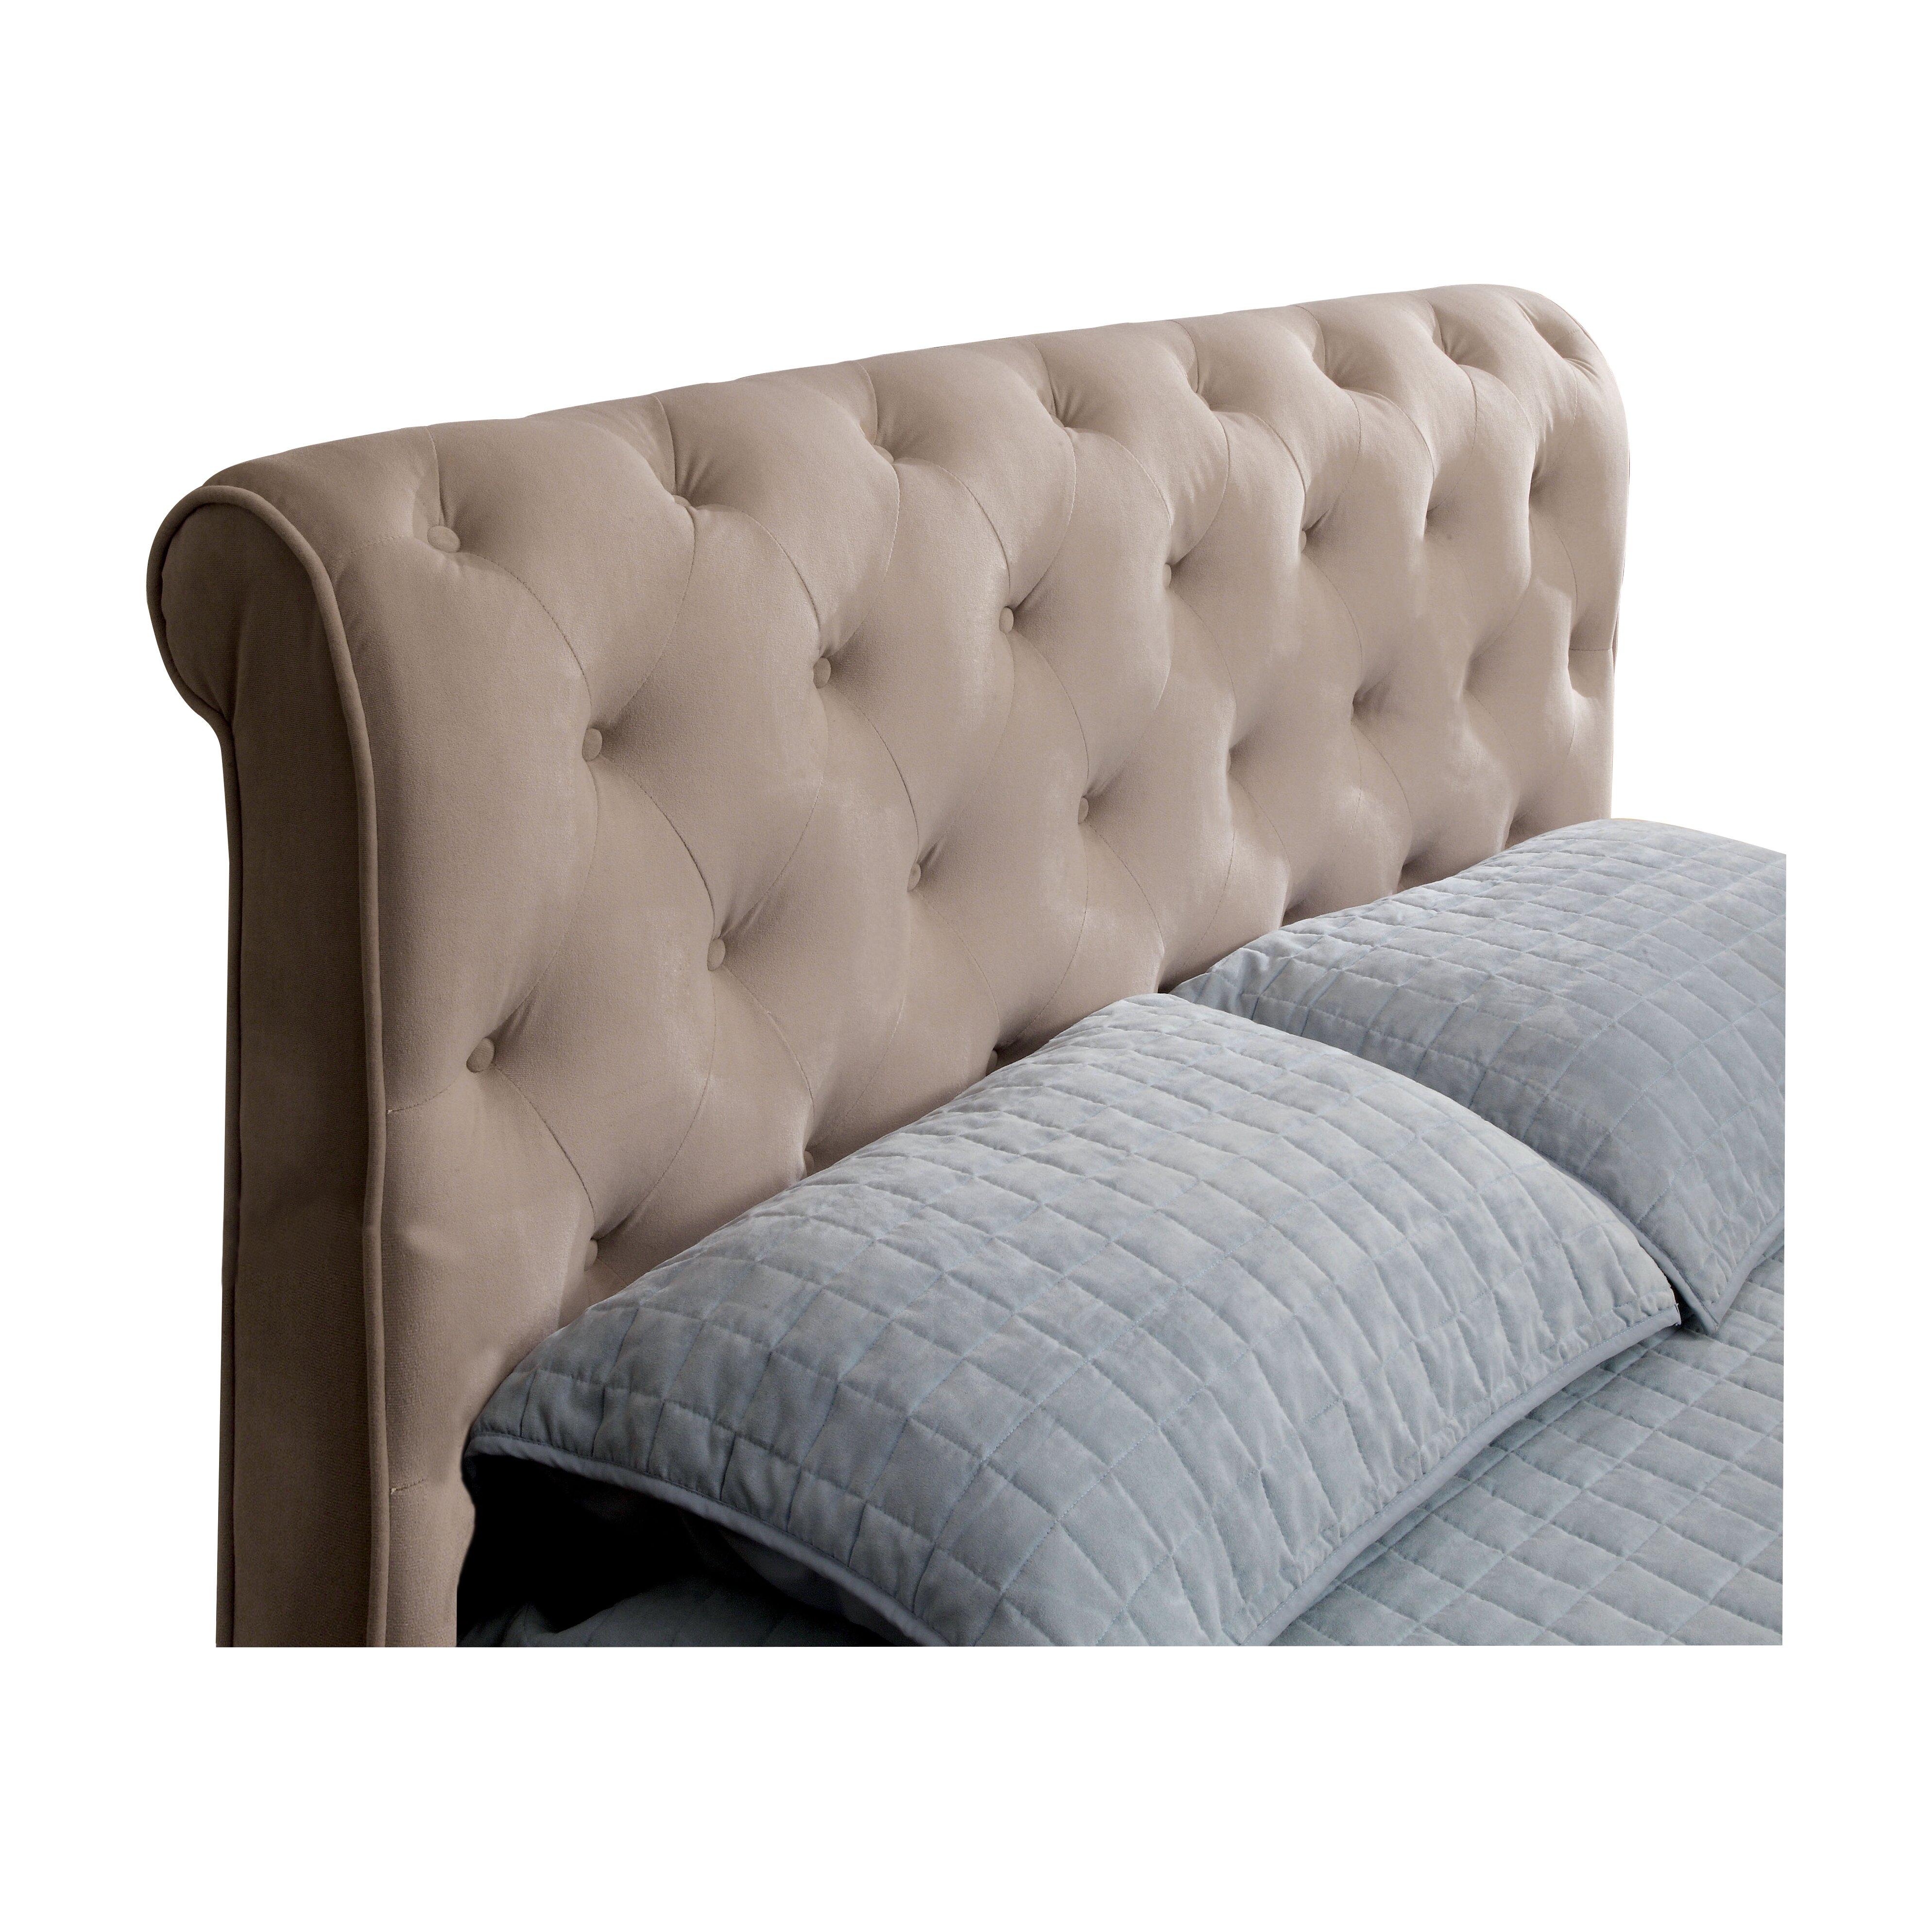 Hokku Designs Concord Upholstered Sleigh Headboard